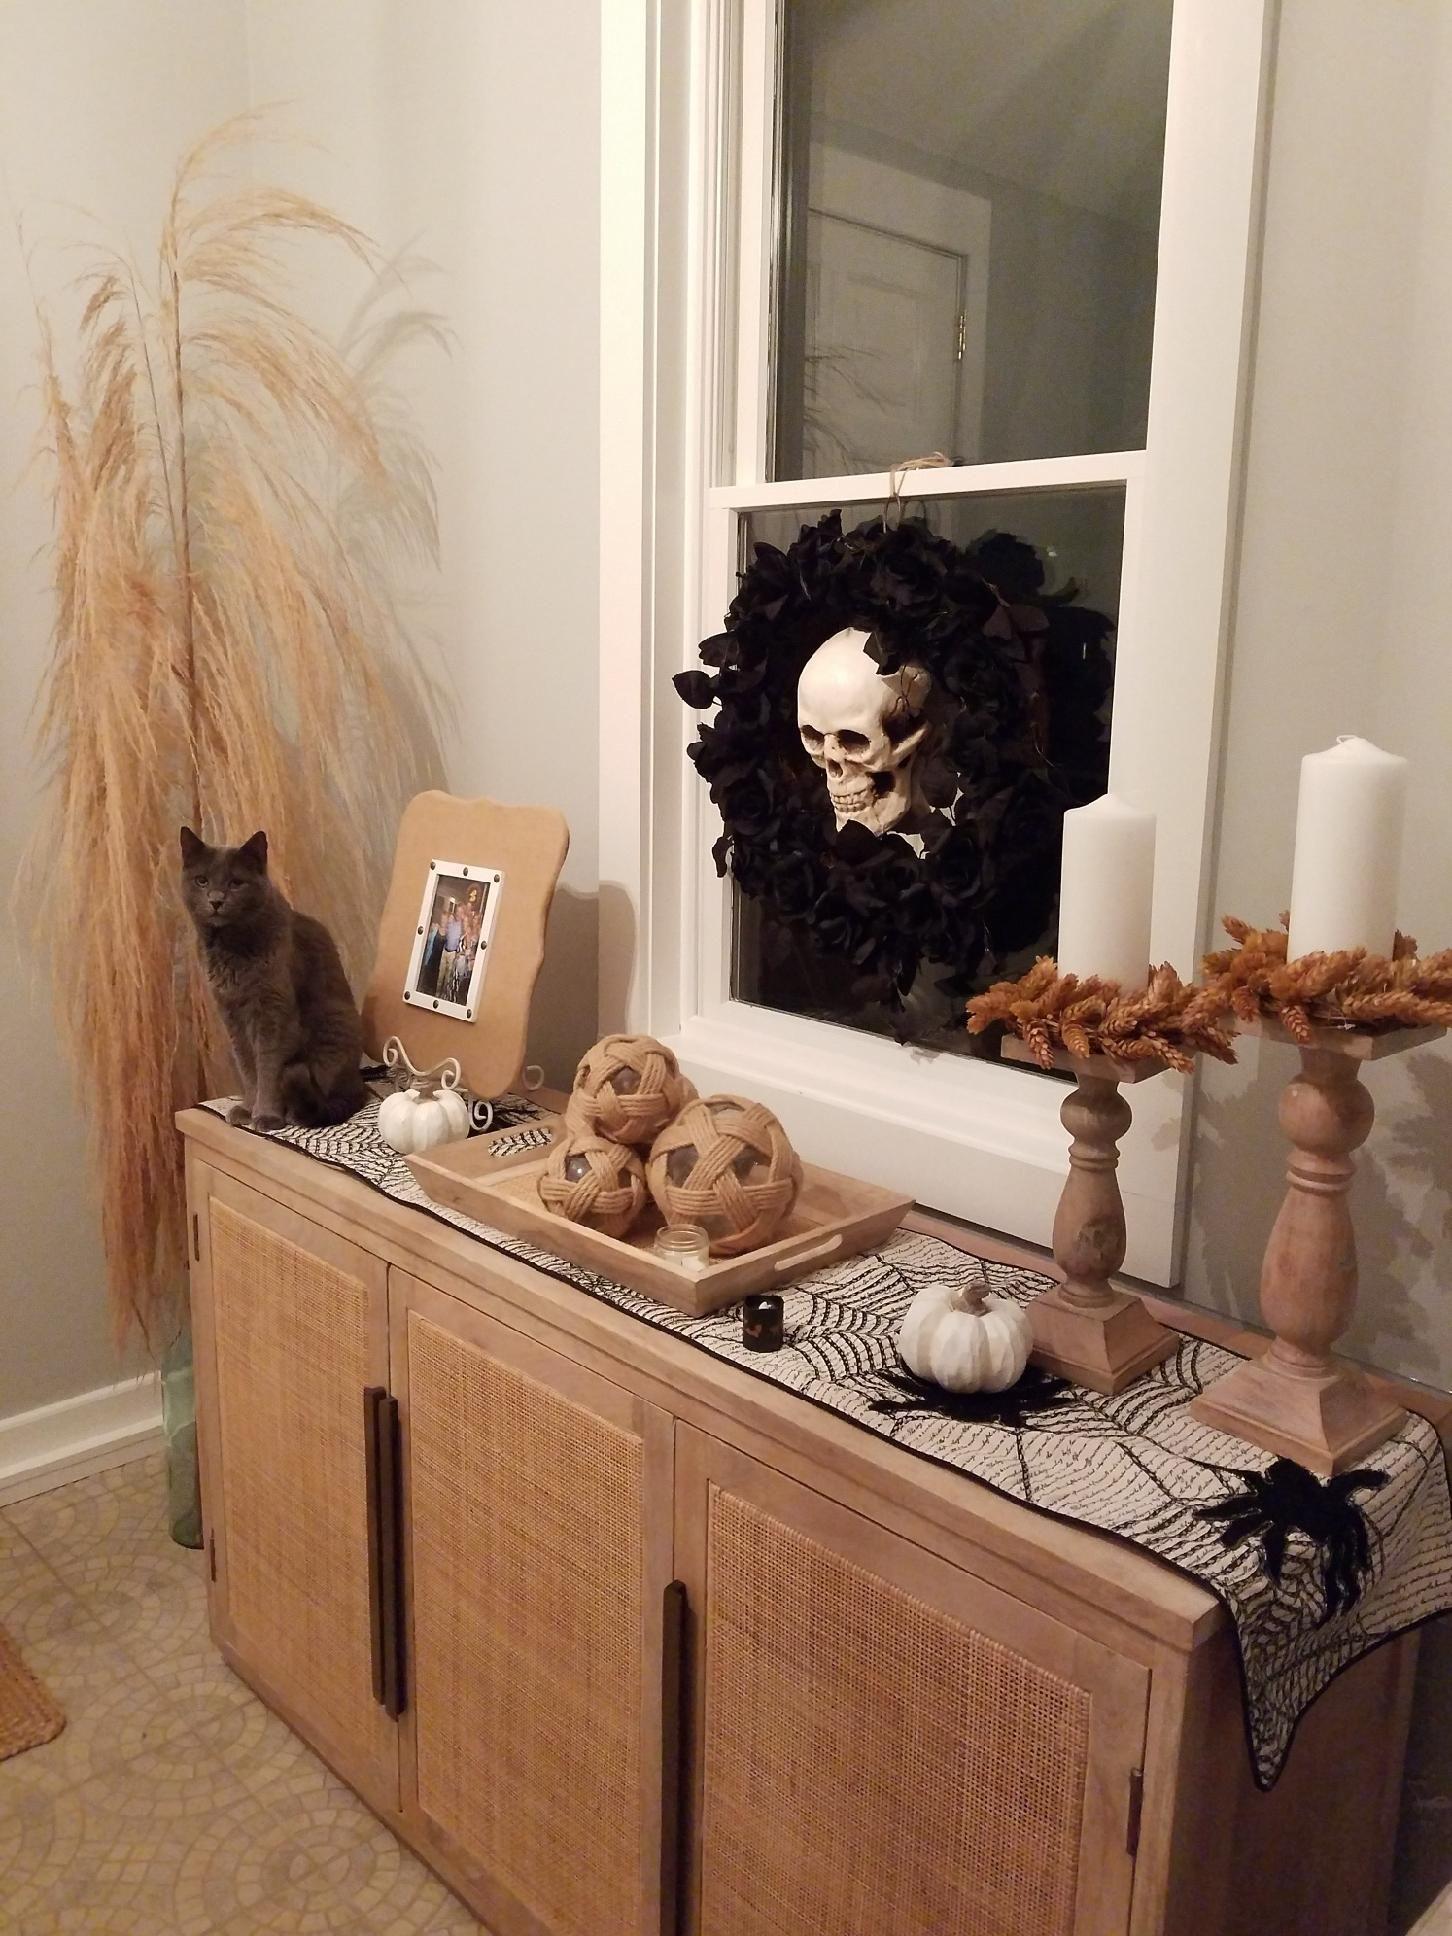 Foyer decor plus Edgar The Cat. #coastalliving #falldecor #halloweendecor